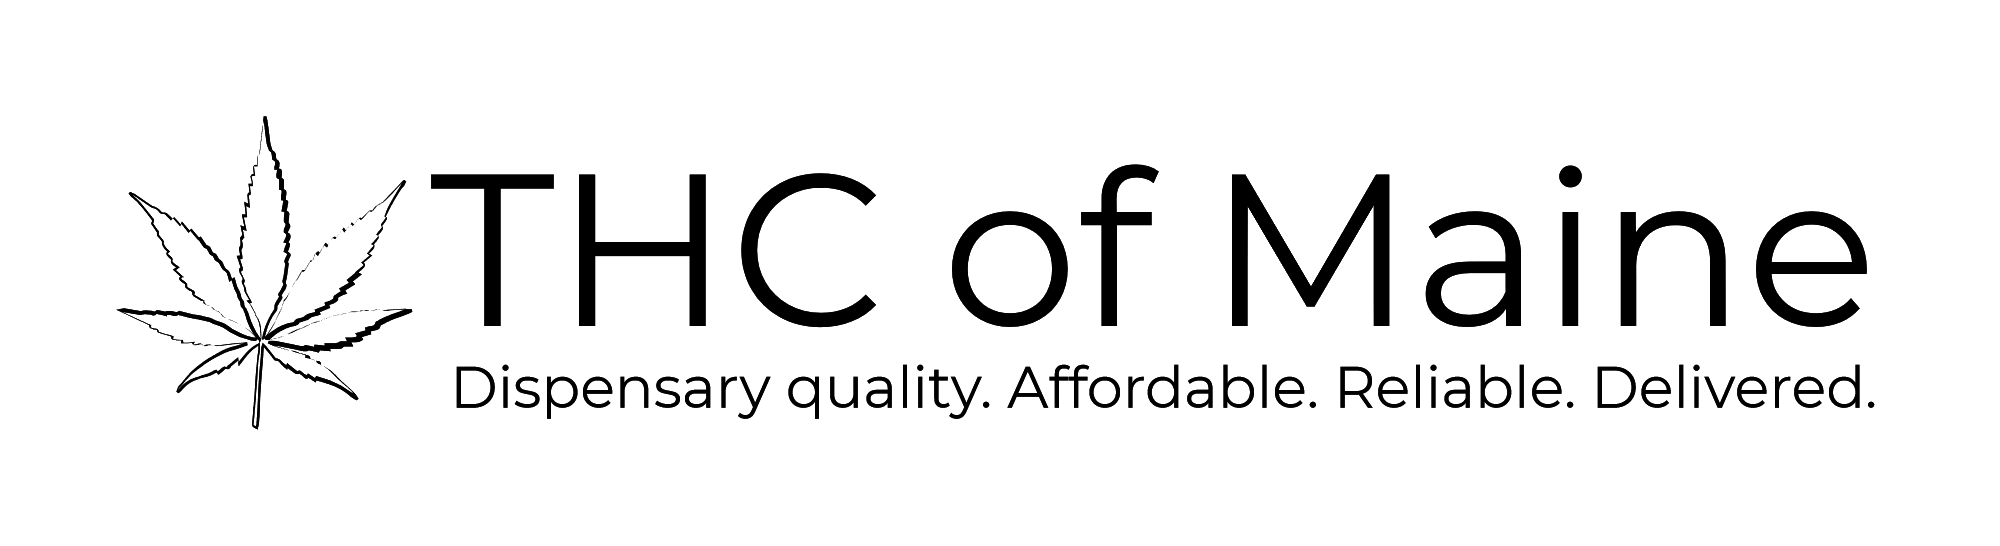 THC of Maine-logo-black-on-white.png